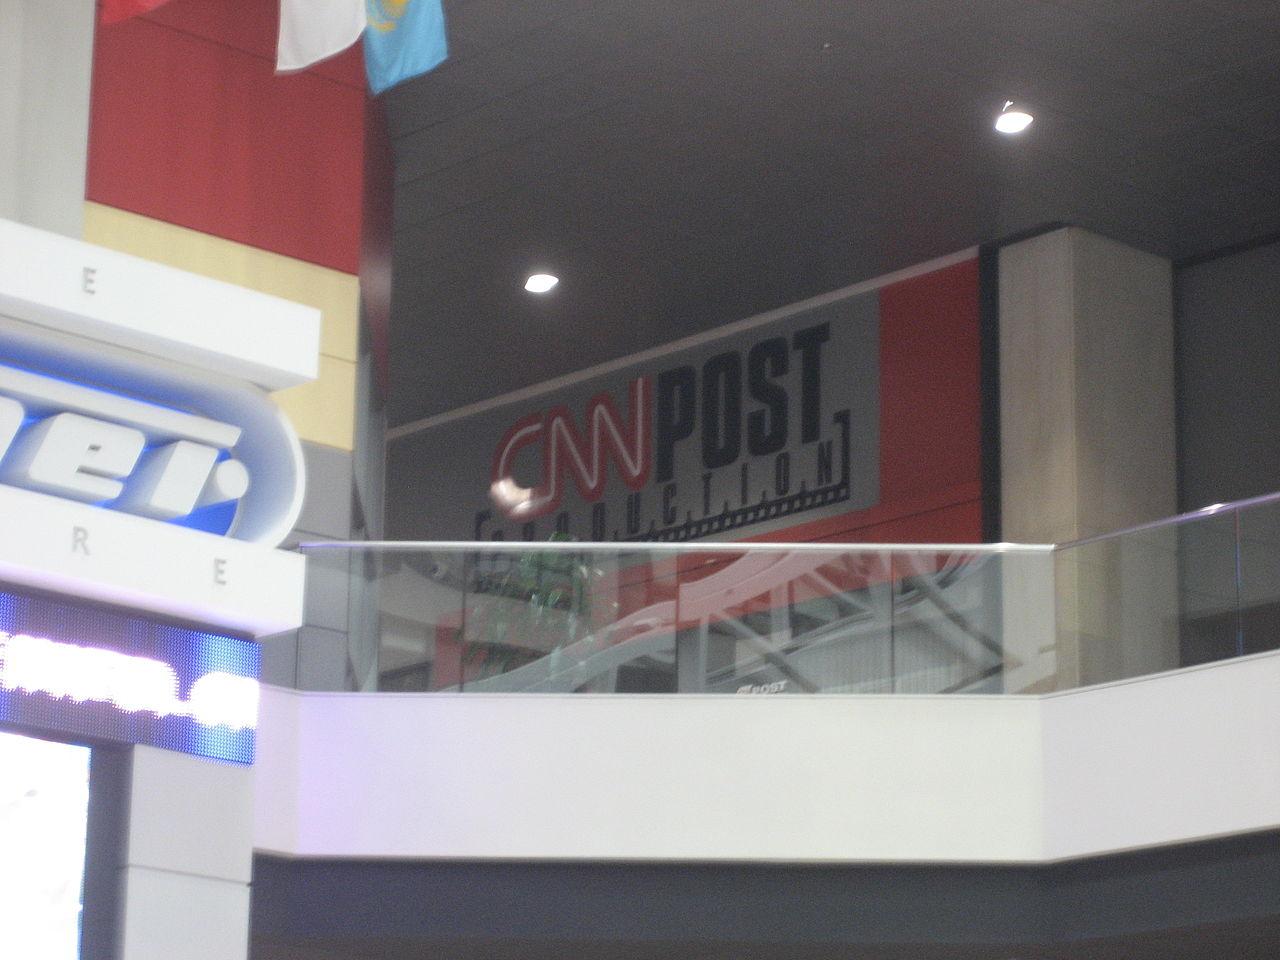 Donald Trump slams media after CNN retraction